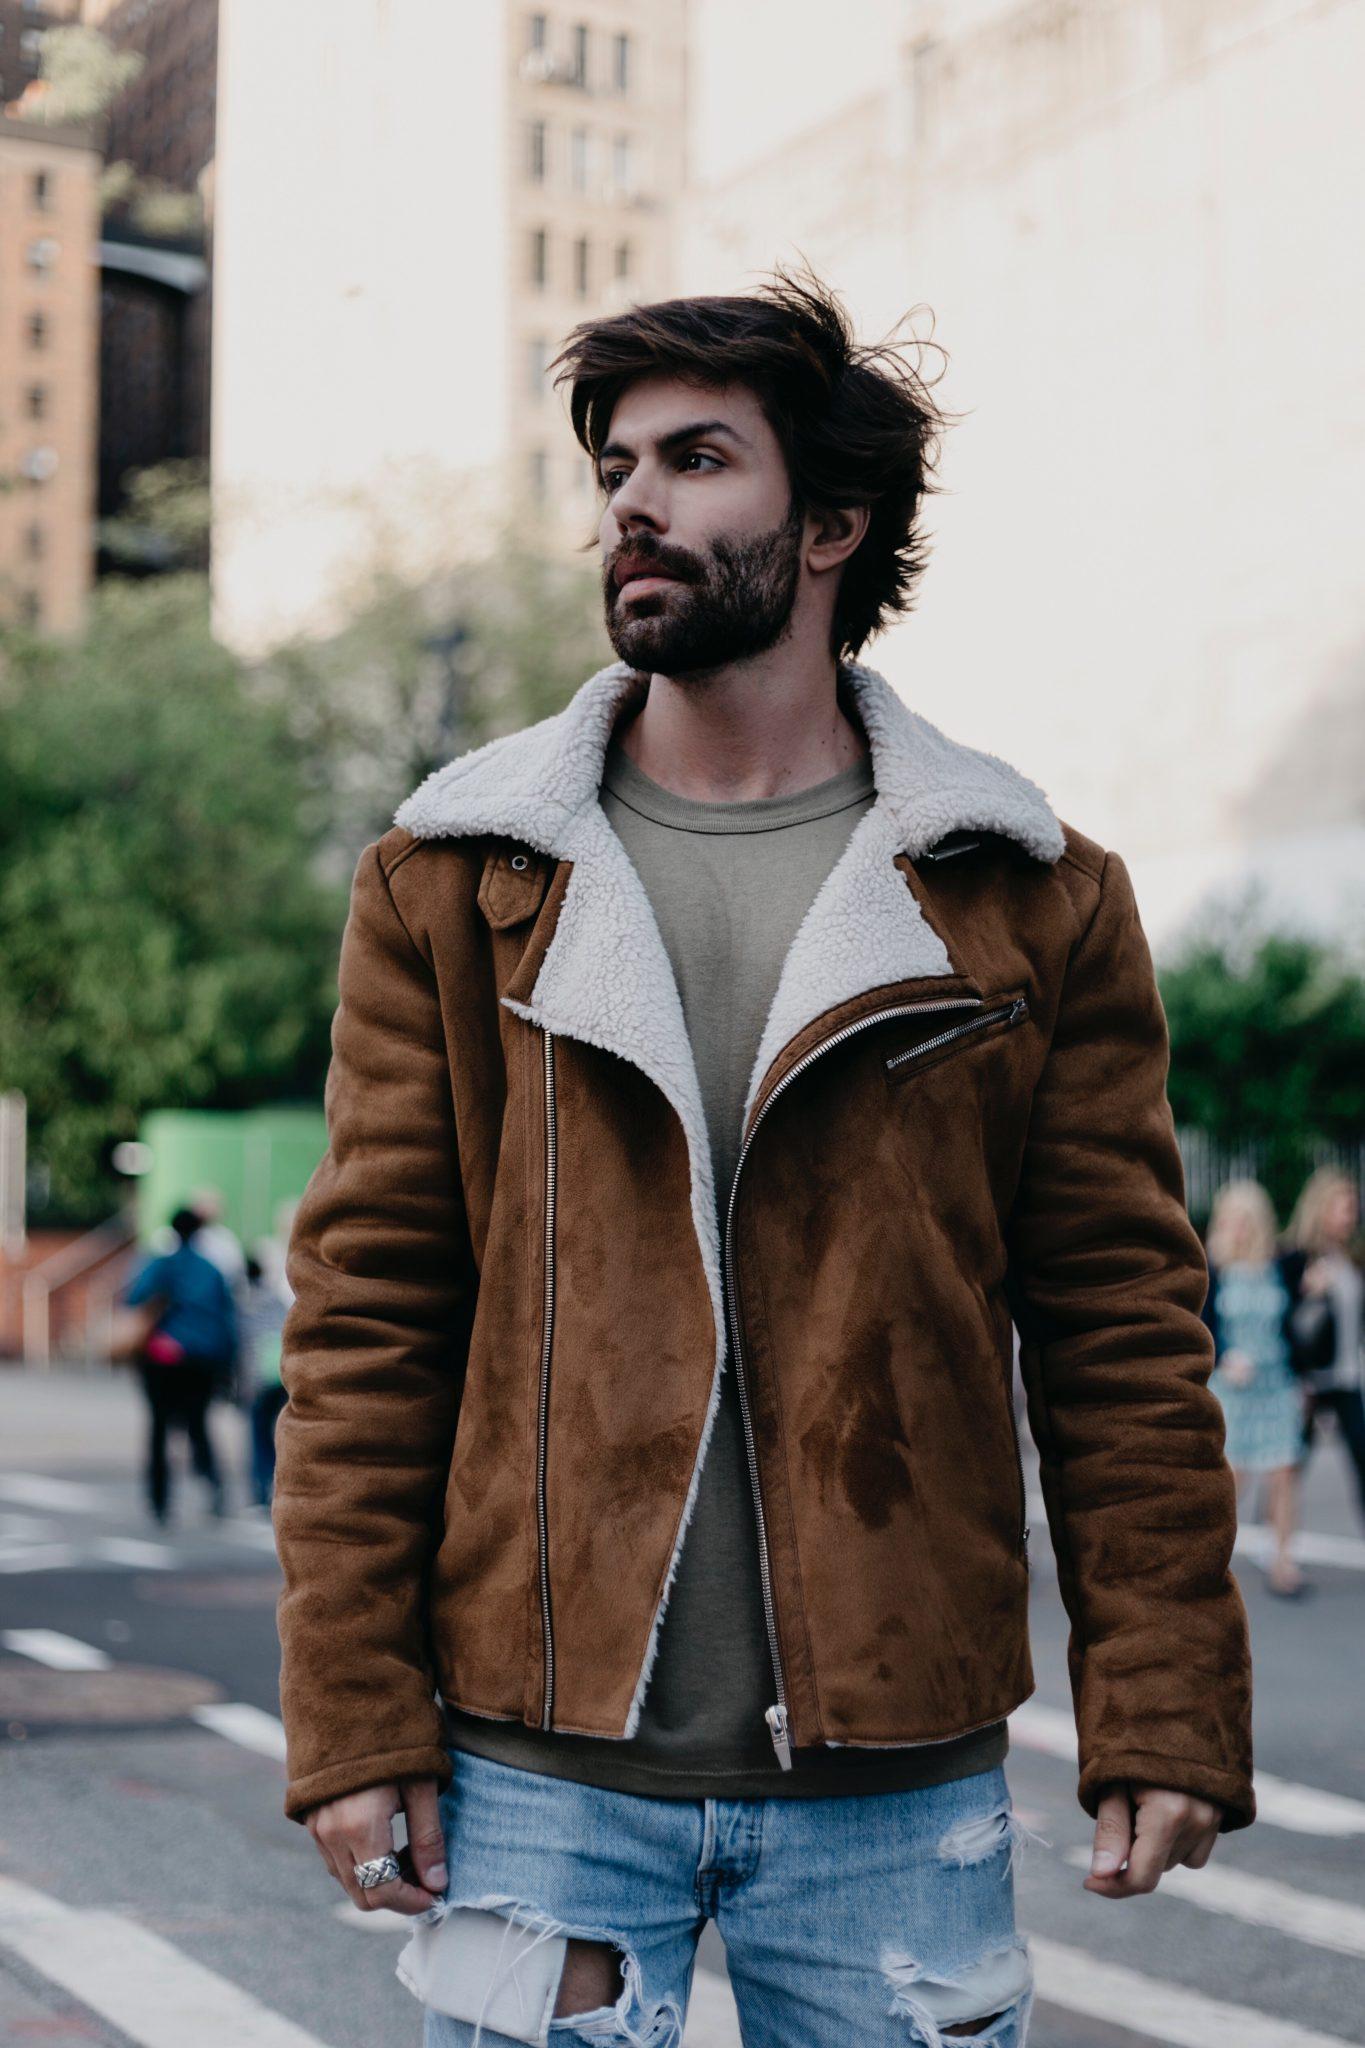 Guilherme Acrizio by Guilherme Benites for Brazilian Male Model